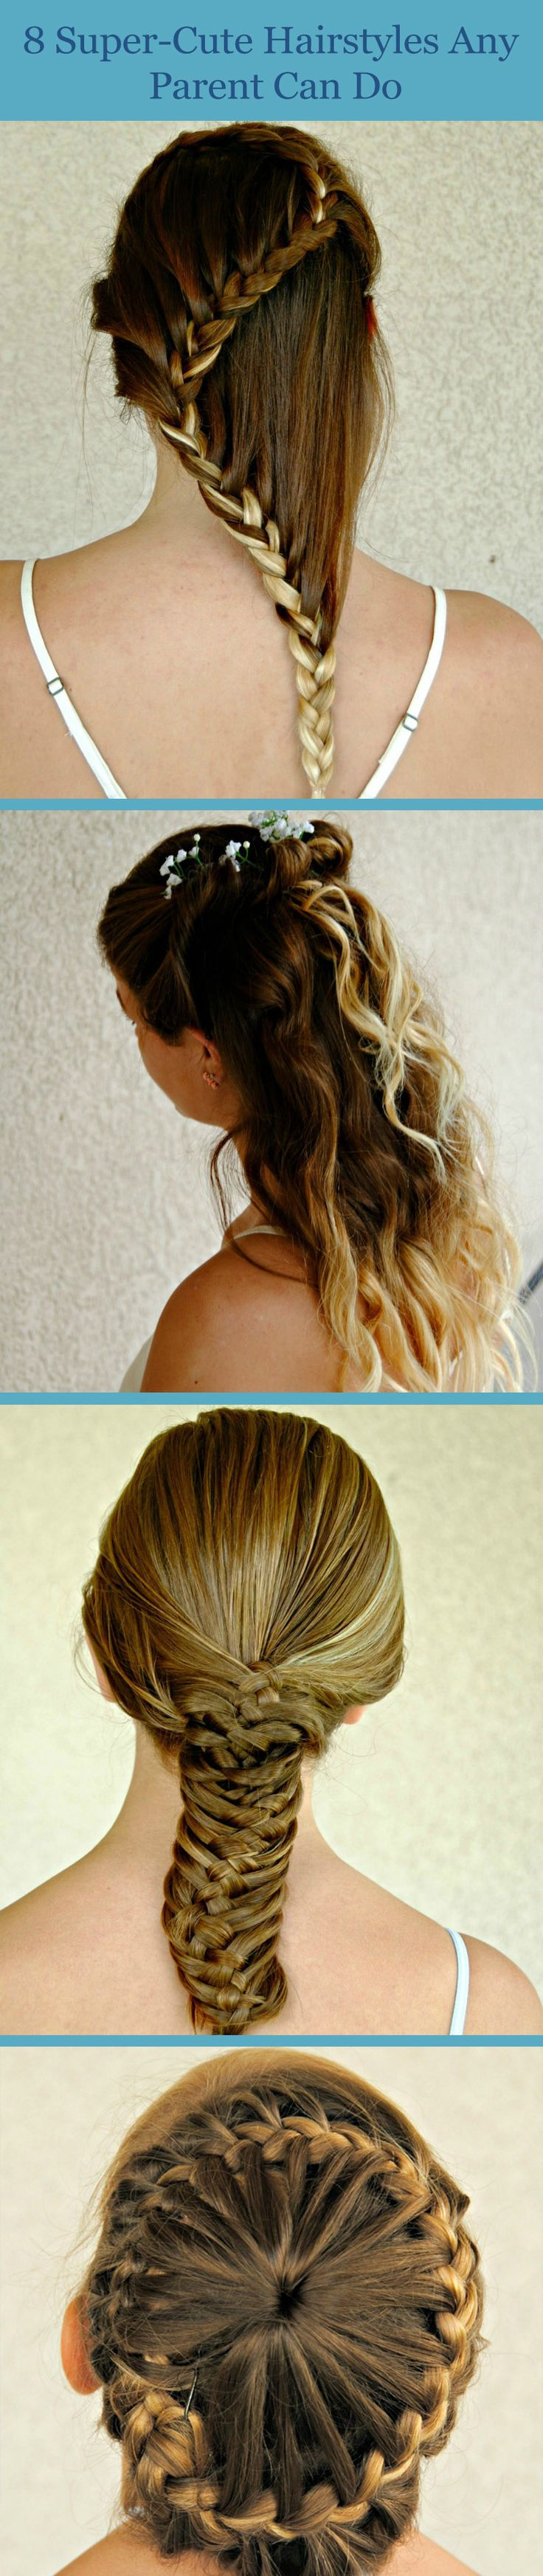 The 25 best Easy kid hairstyles ideas on Pinterest